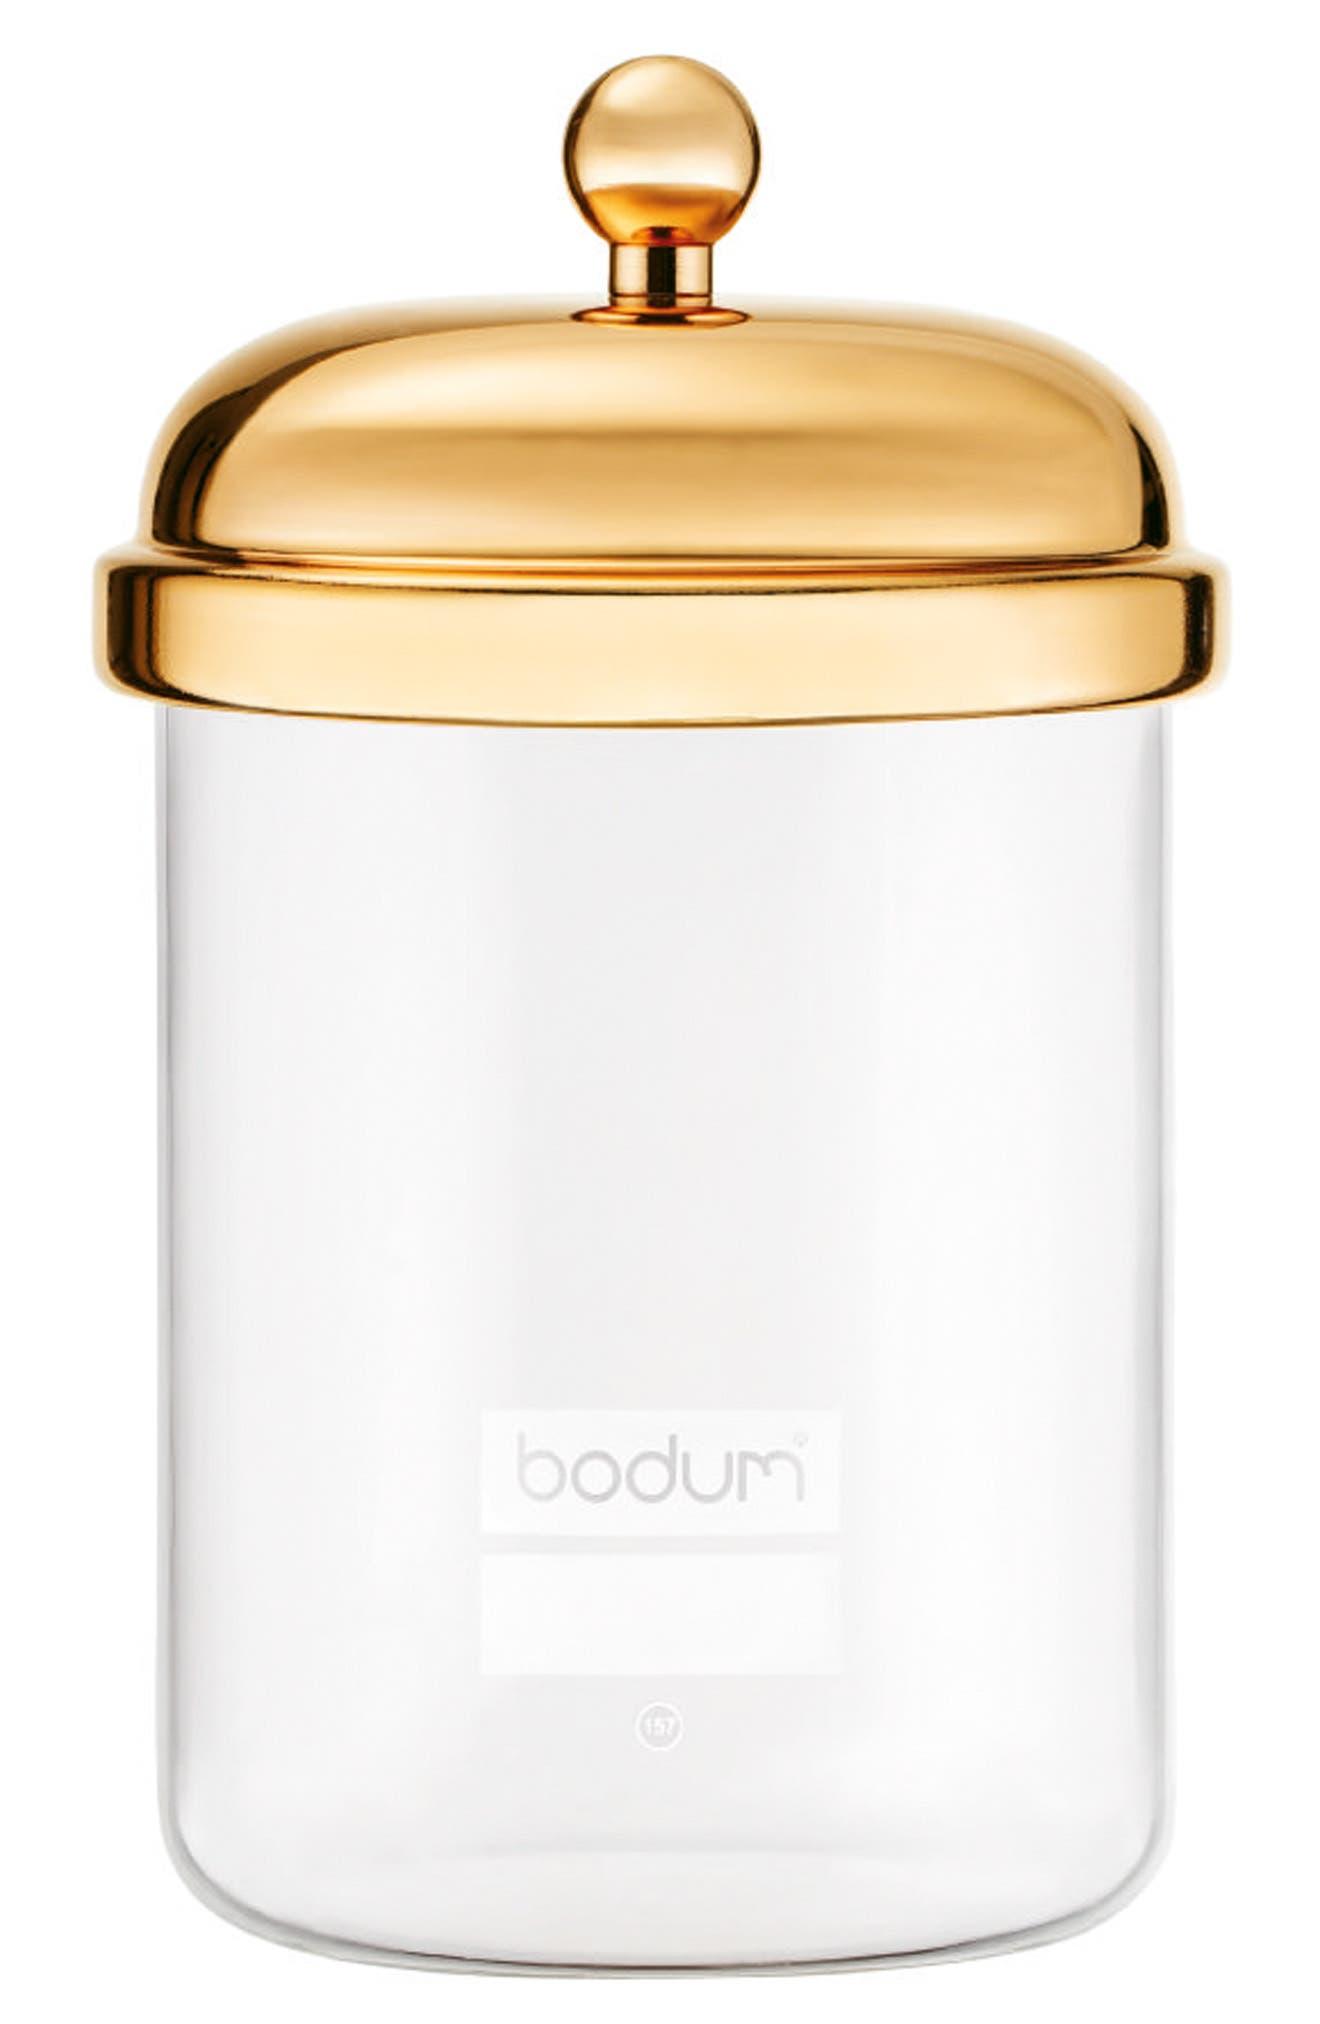 Main Image - bodum Classic Storage Jar